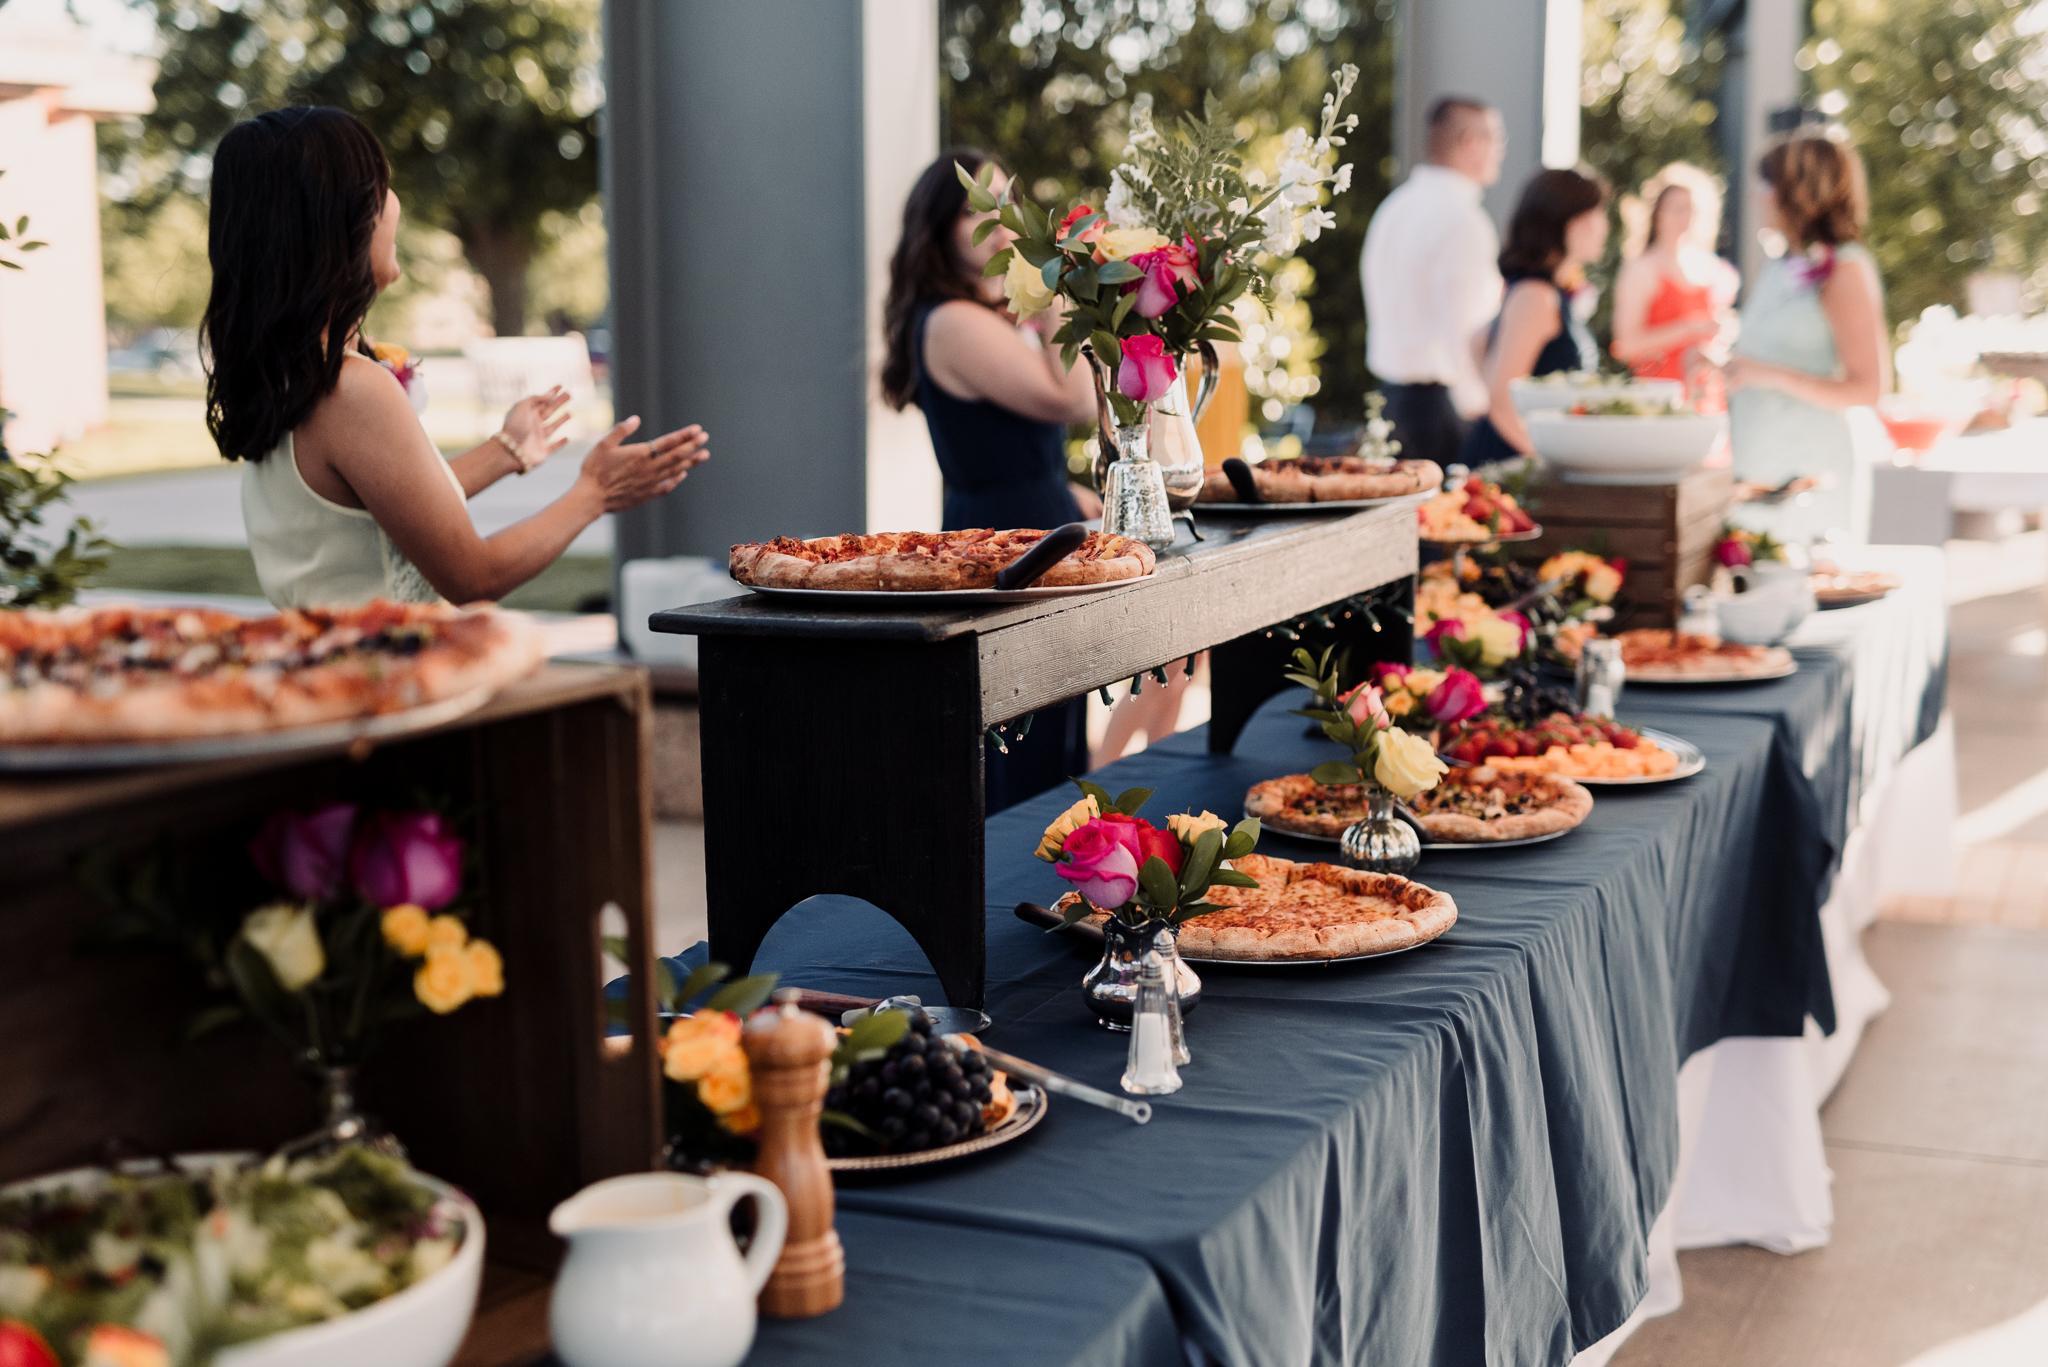 Oklahoma-Christian-University-Wedding-8390.jpg